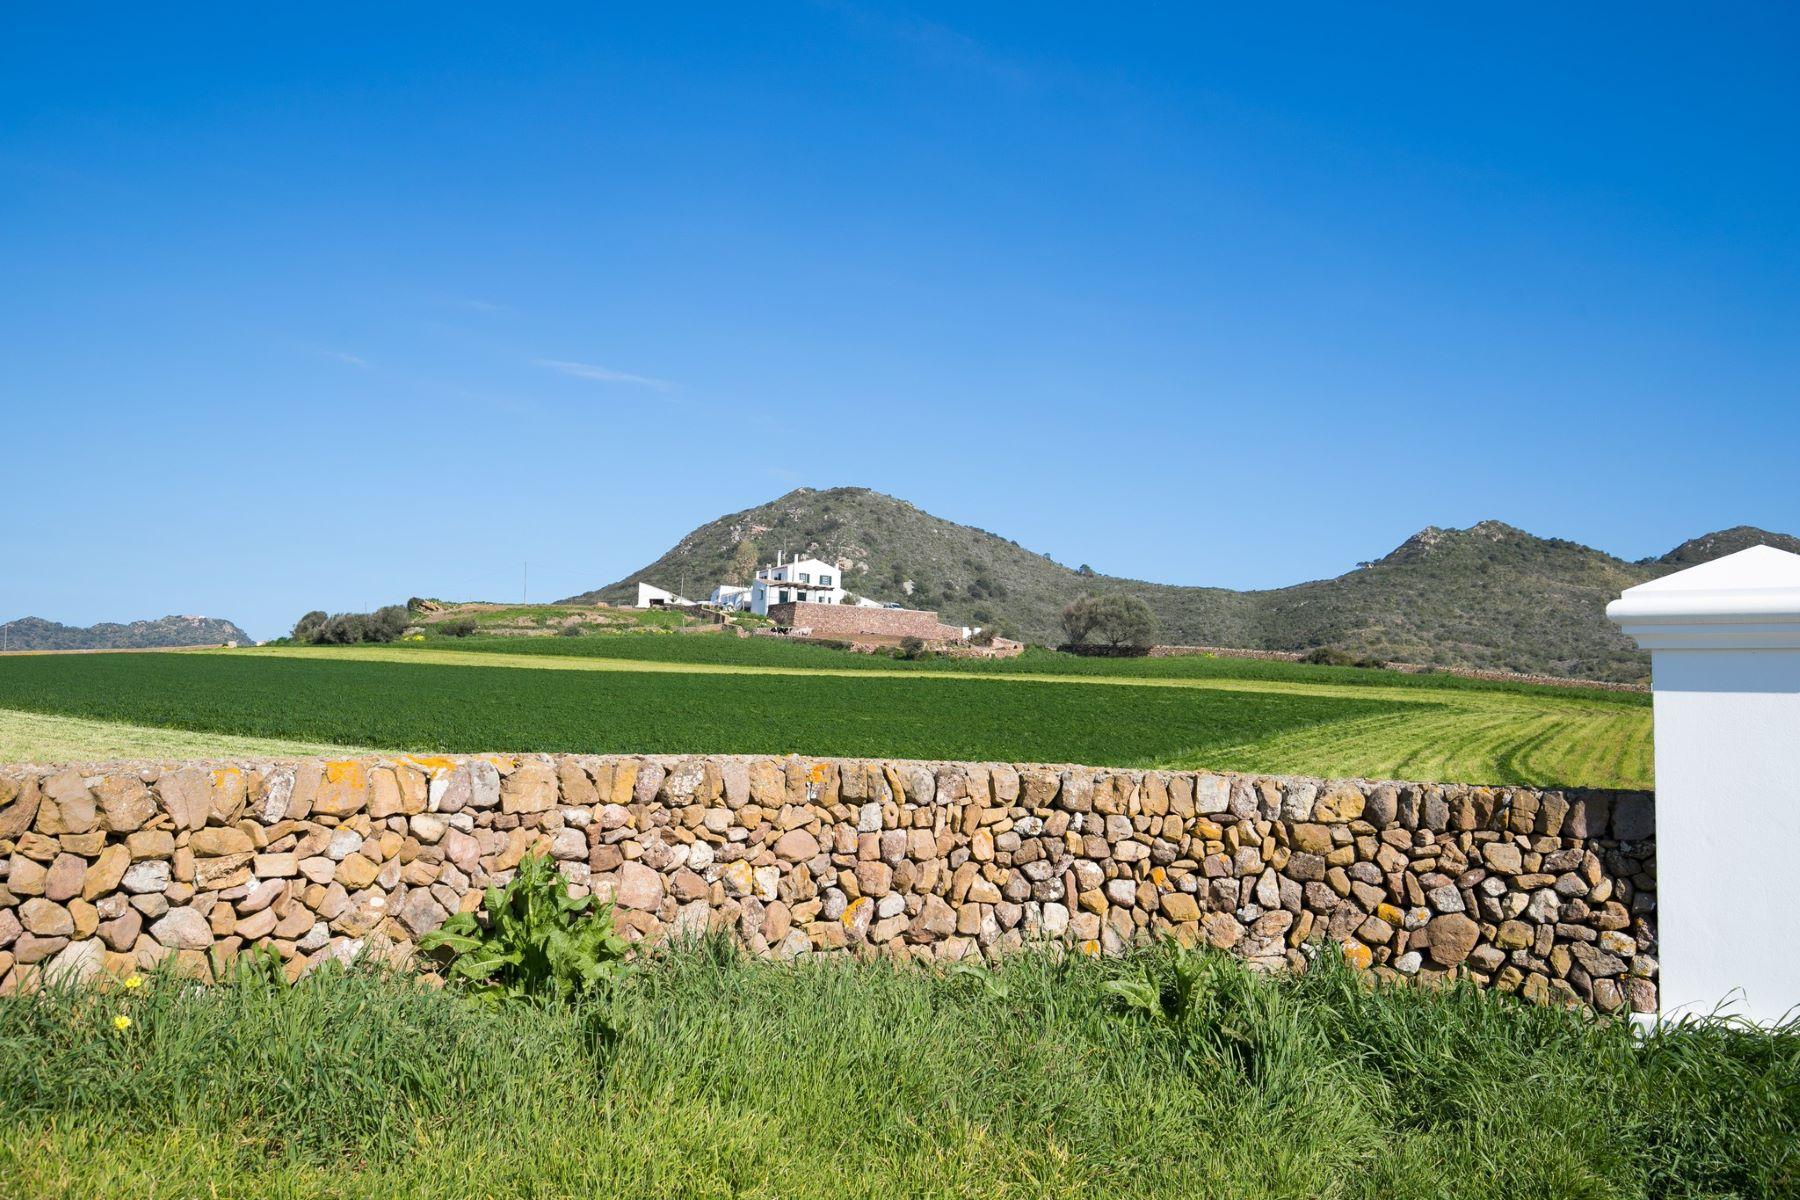 獨棟家庭住宅 為 出售 在 Adorable agricultural exploitation farm Menorca, 梅諾卡島, 西班牙